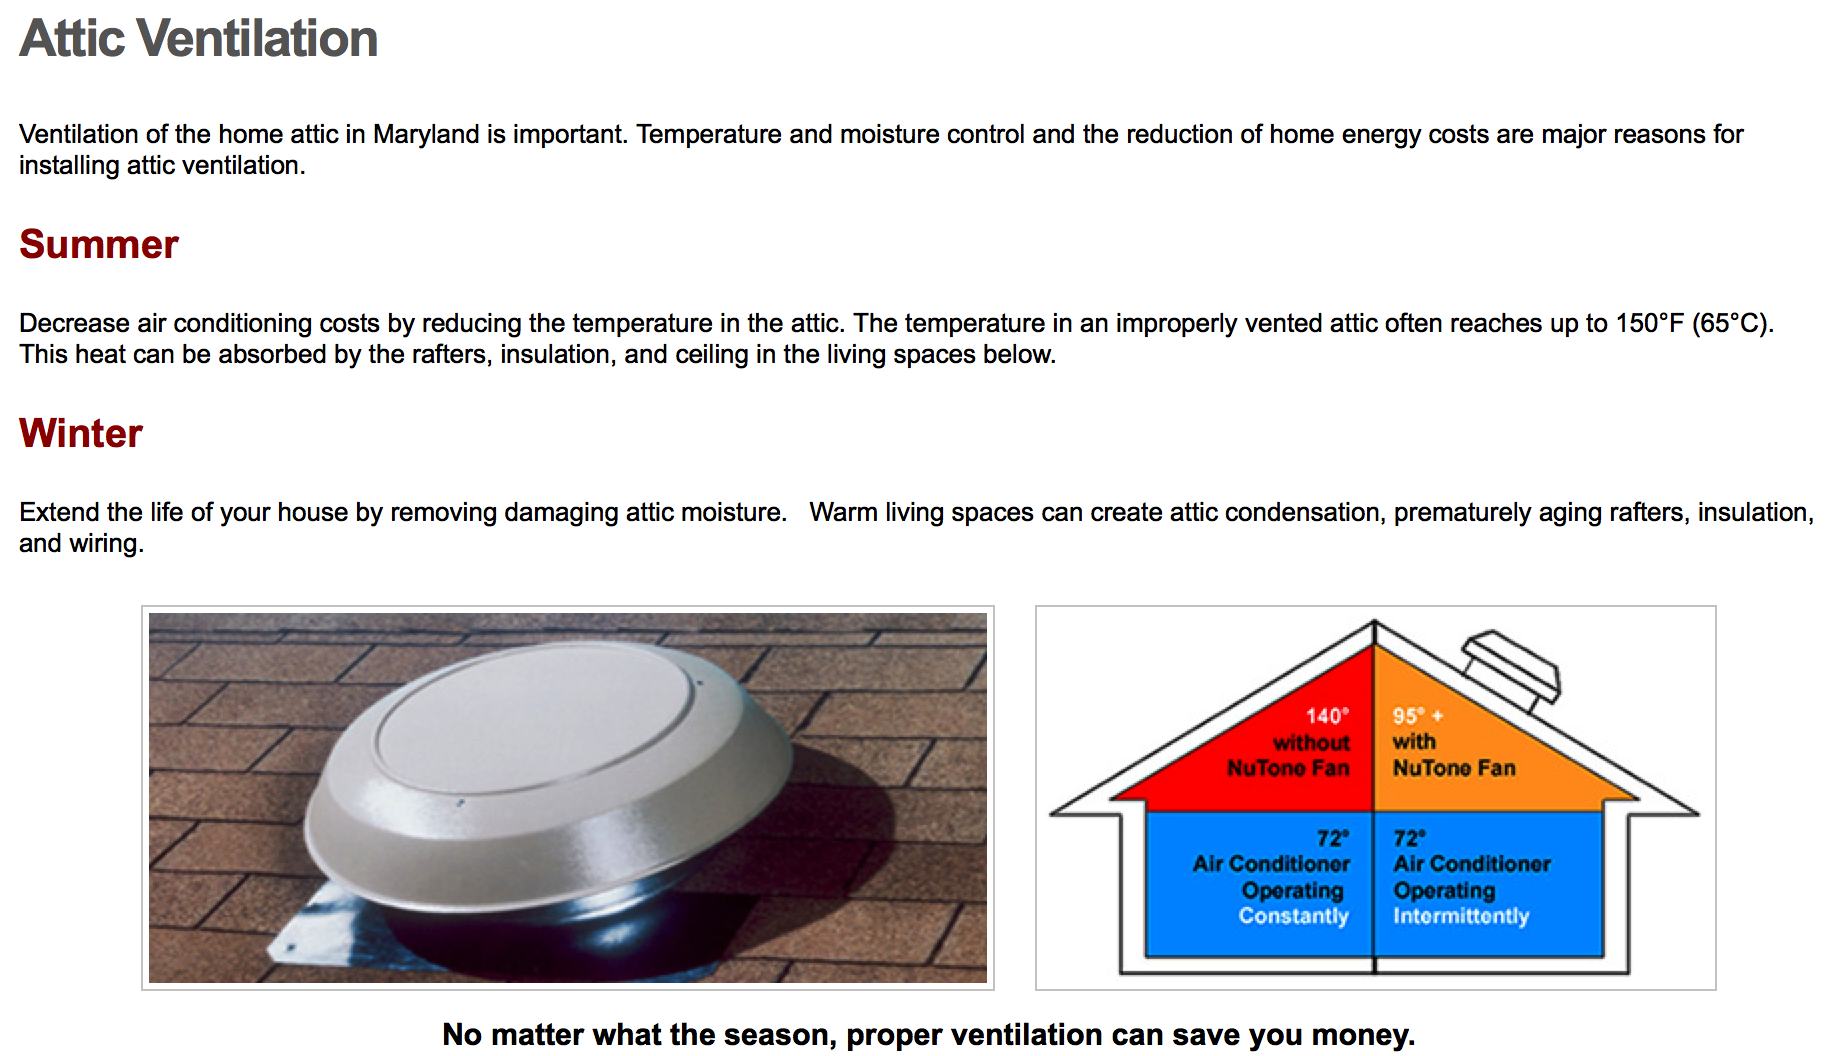 Attic Ventilation Stetten Home Services Wiring Through Nutone Screen Shot